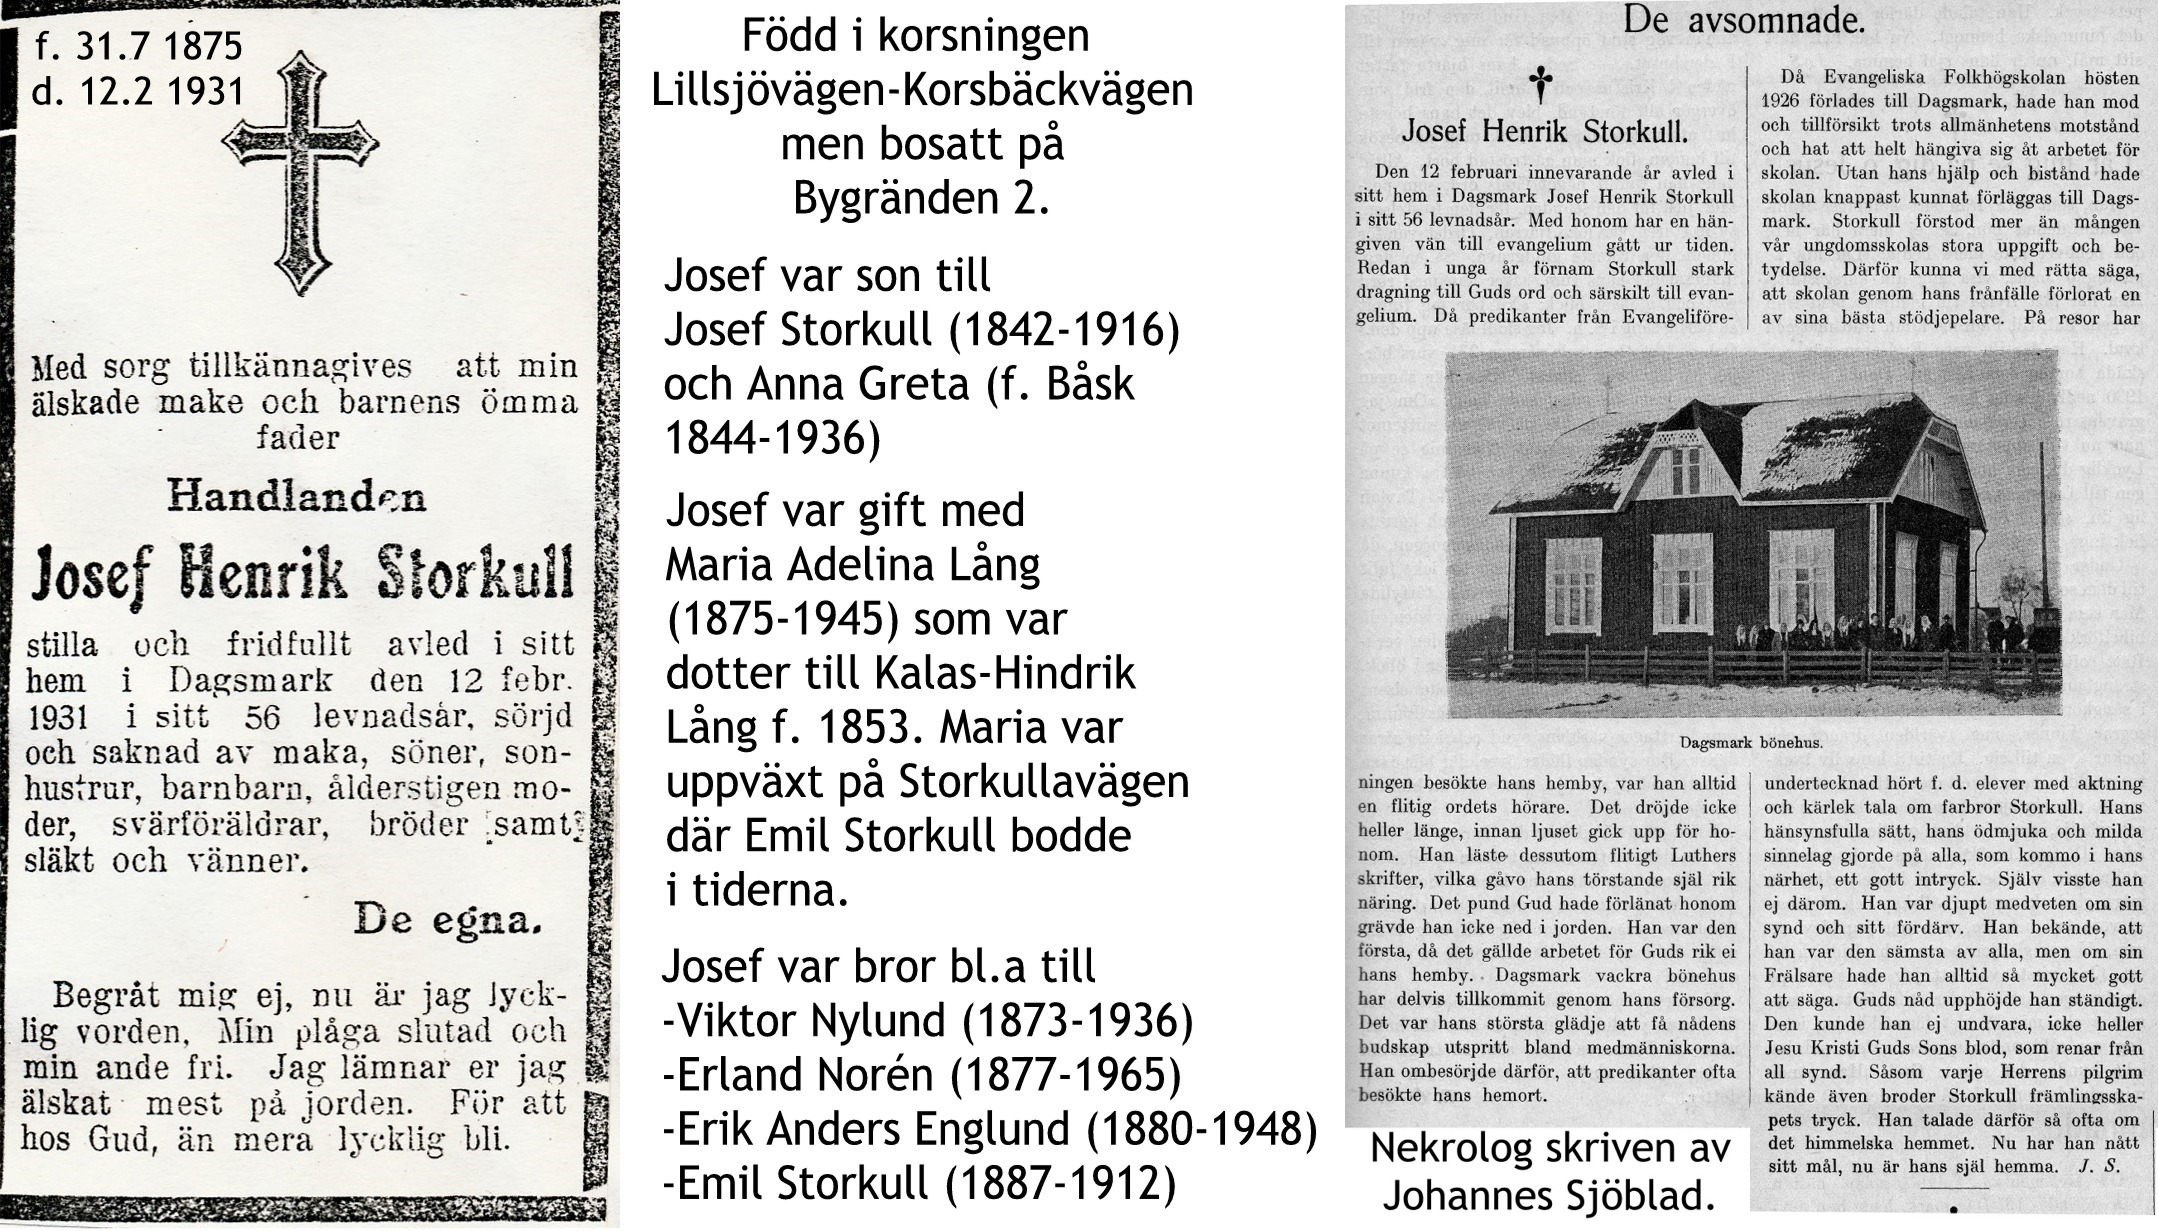 Storkull Josef Henrik handlande